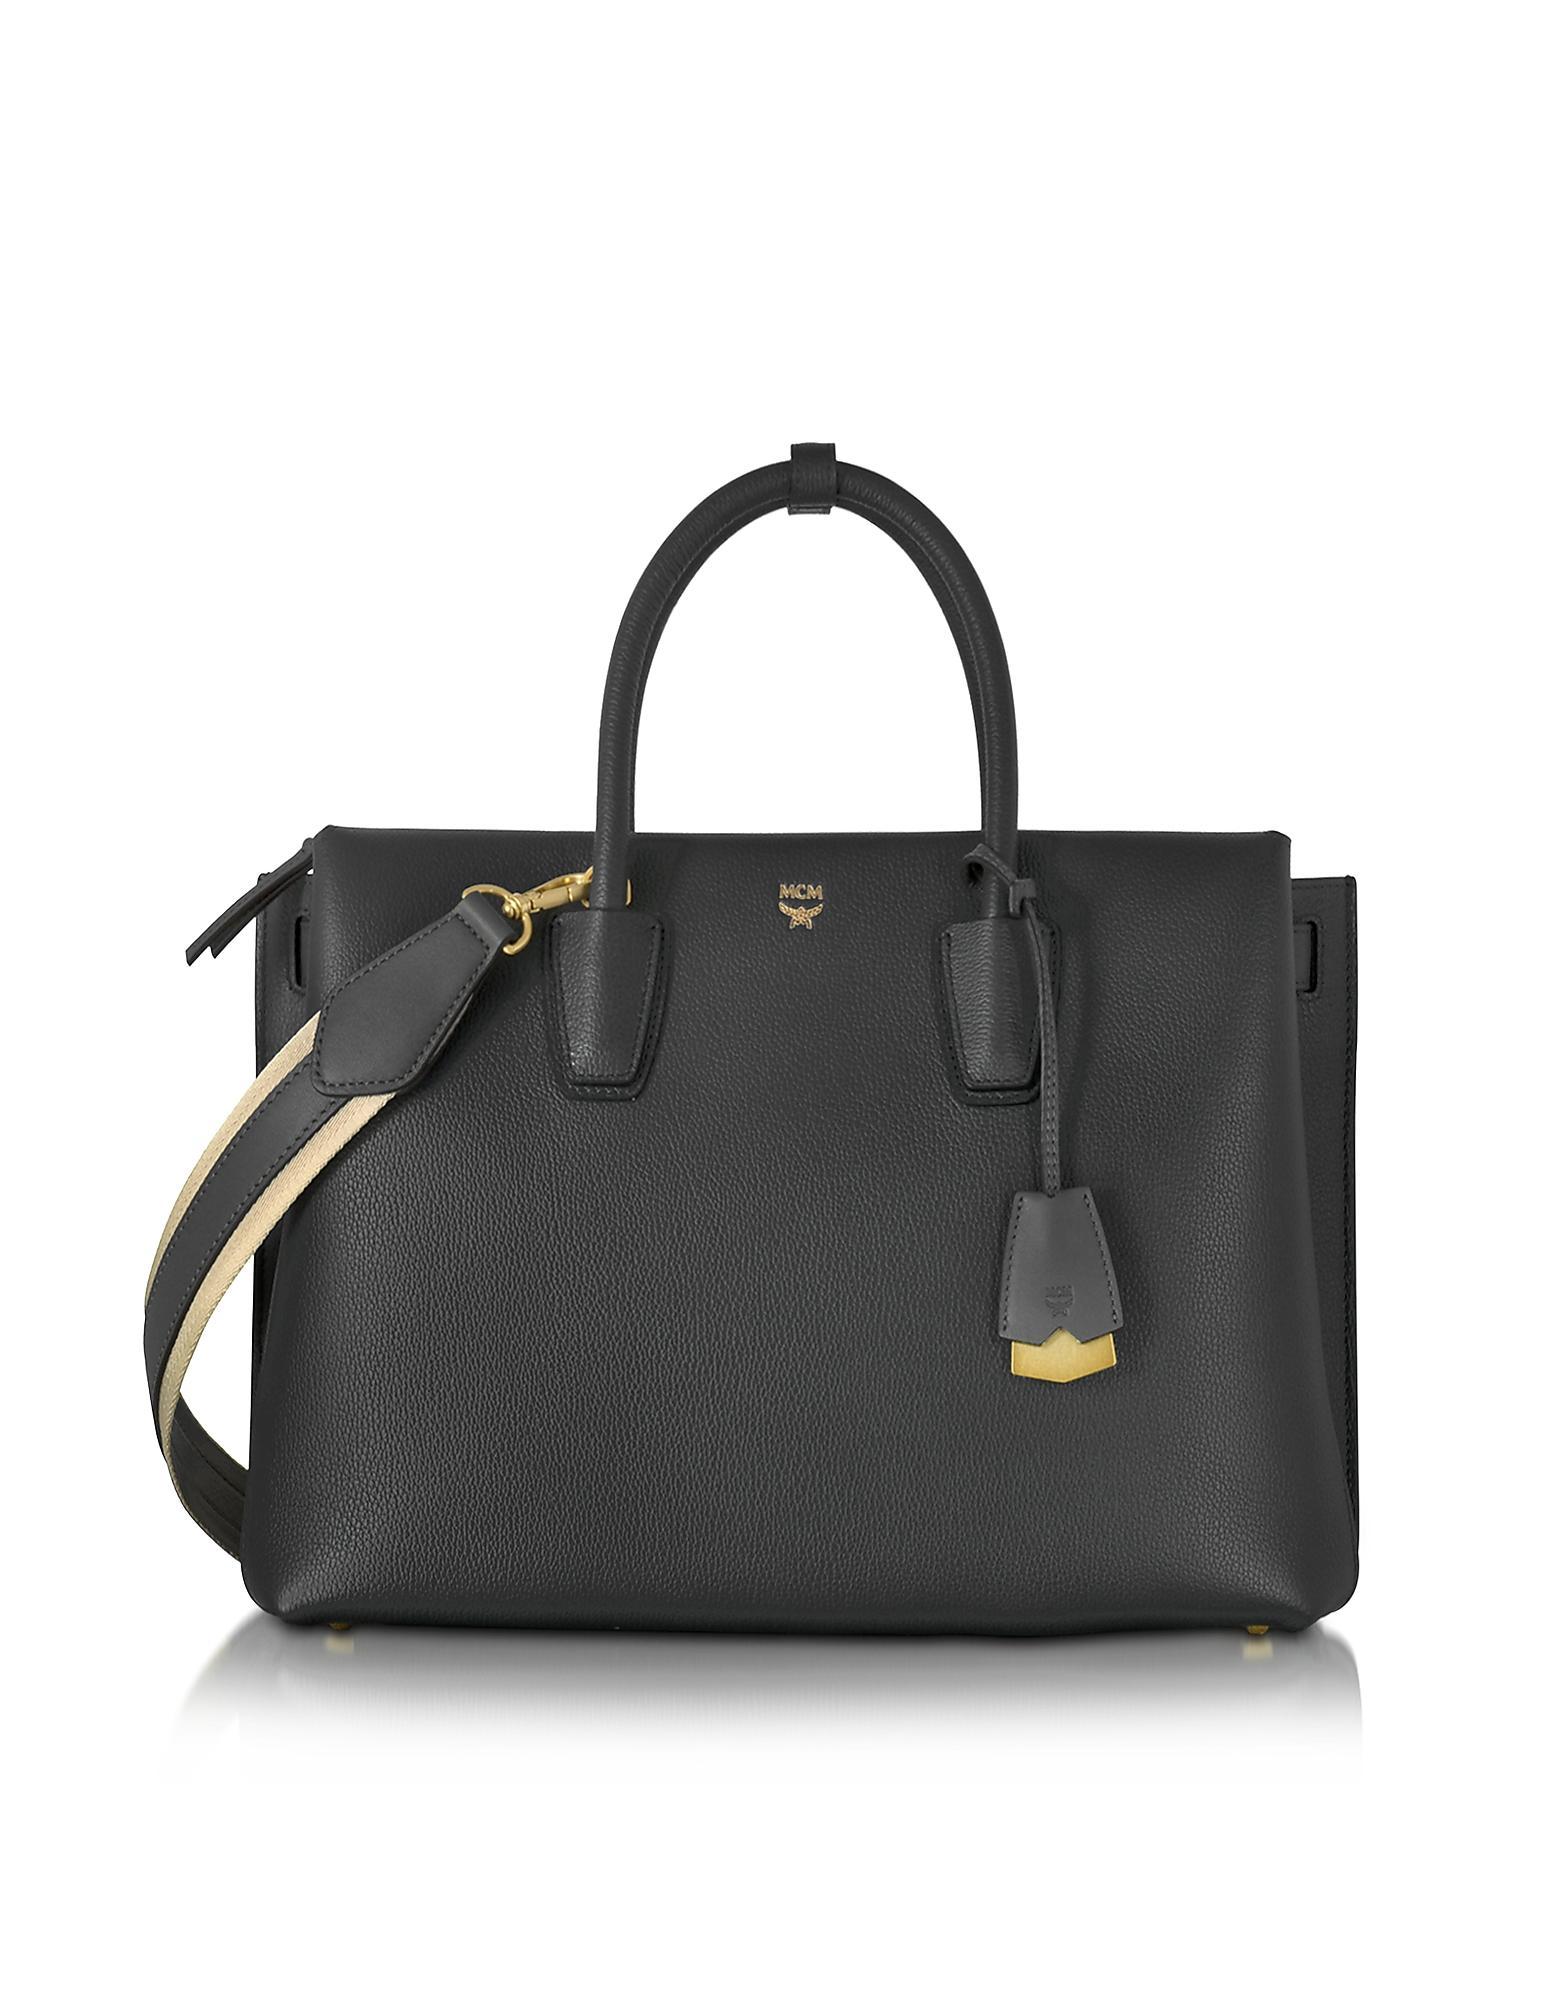 VIDA Statement Bag - Royal Reflection S-Bag by VIDA rImeetKbL